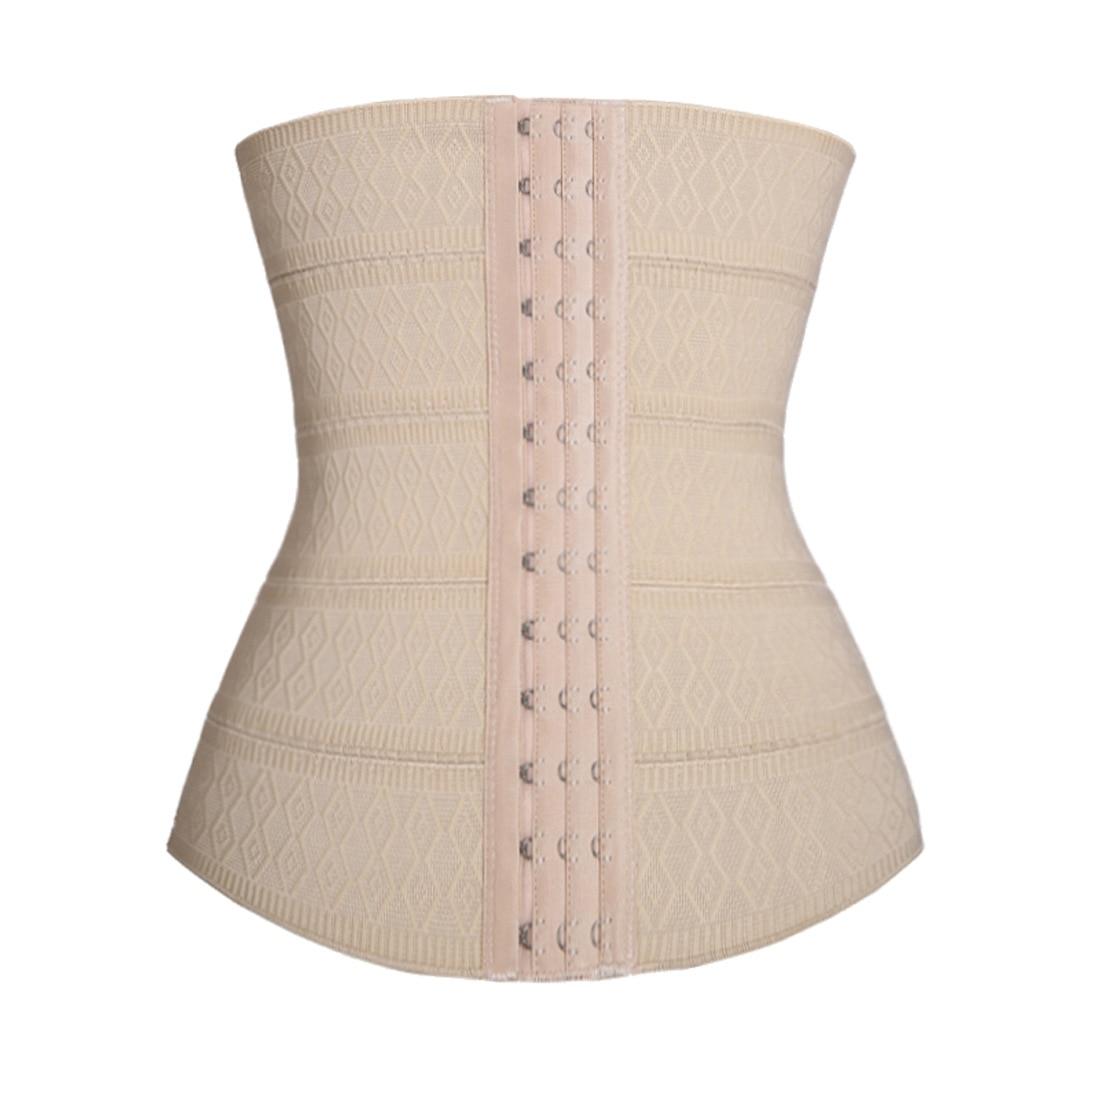 3a3934087b Women elastic band slimming band body shaper belt control tummy waist  cinchers bra lifter belly girdles firm slim stomach corset-in Waist Cinchers  from ...